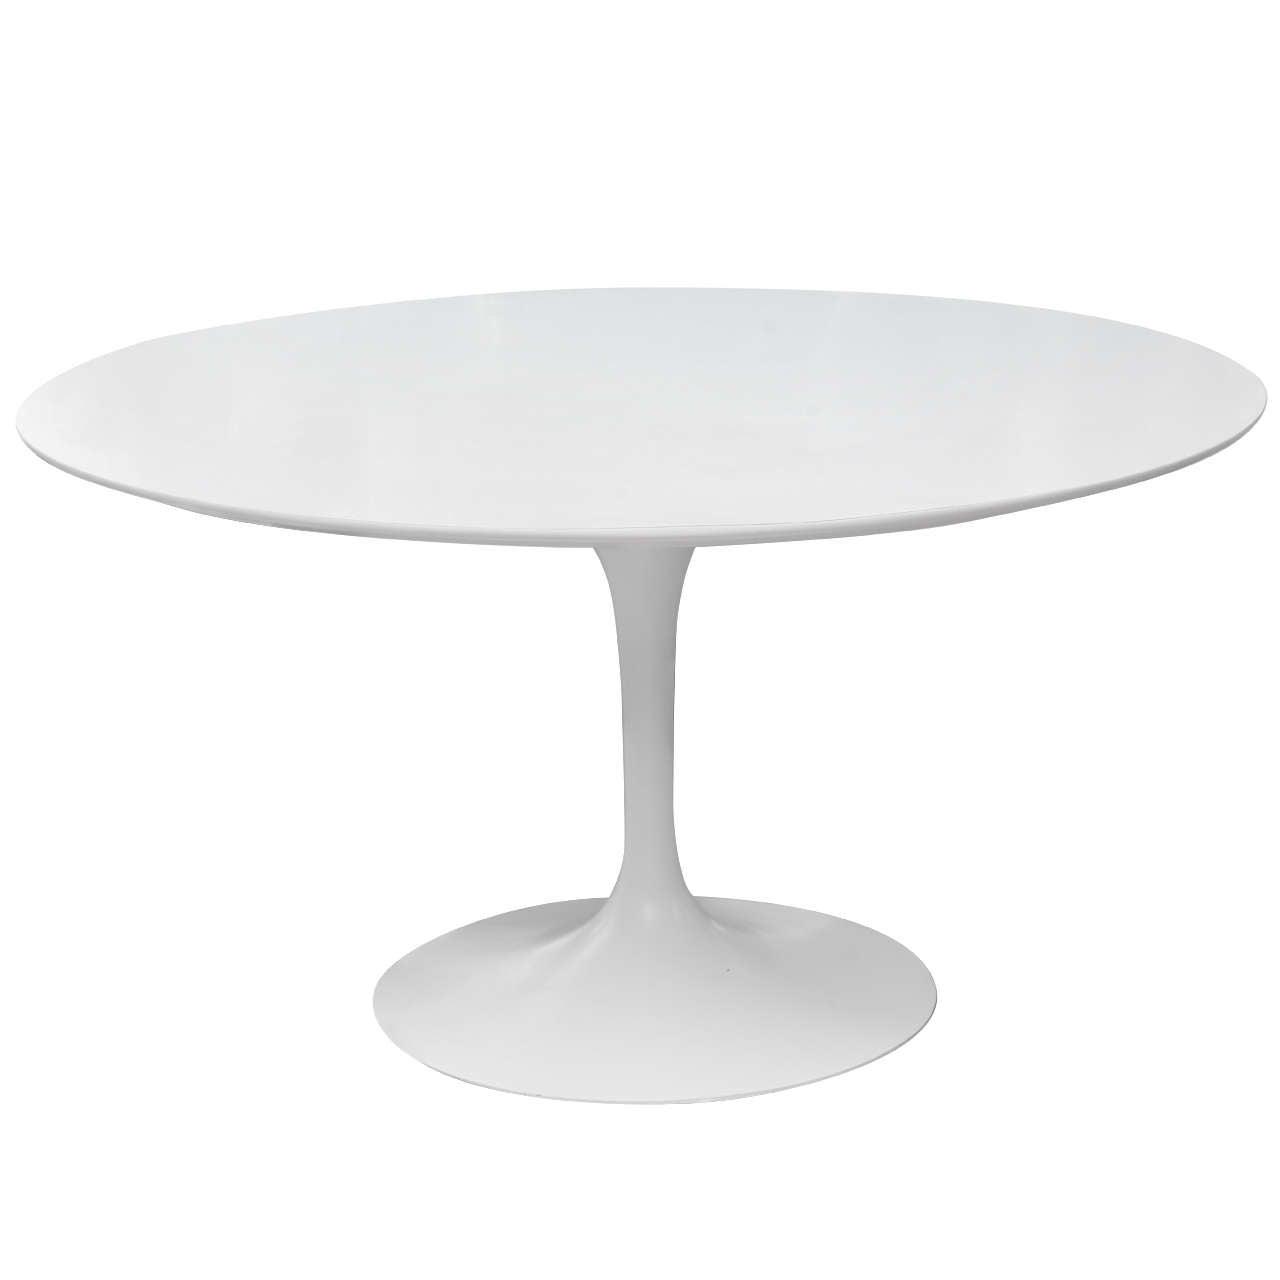 vintage knoll saarinen dining table at 1stdibs. Black Bedroom Furniture Sets. Home Design Ideas